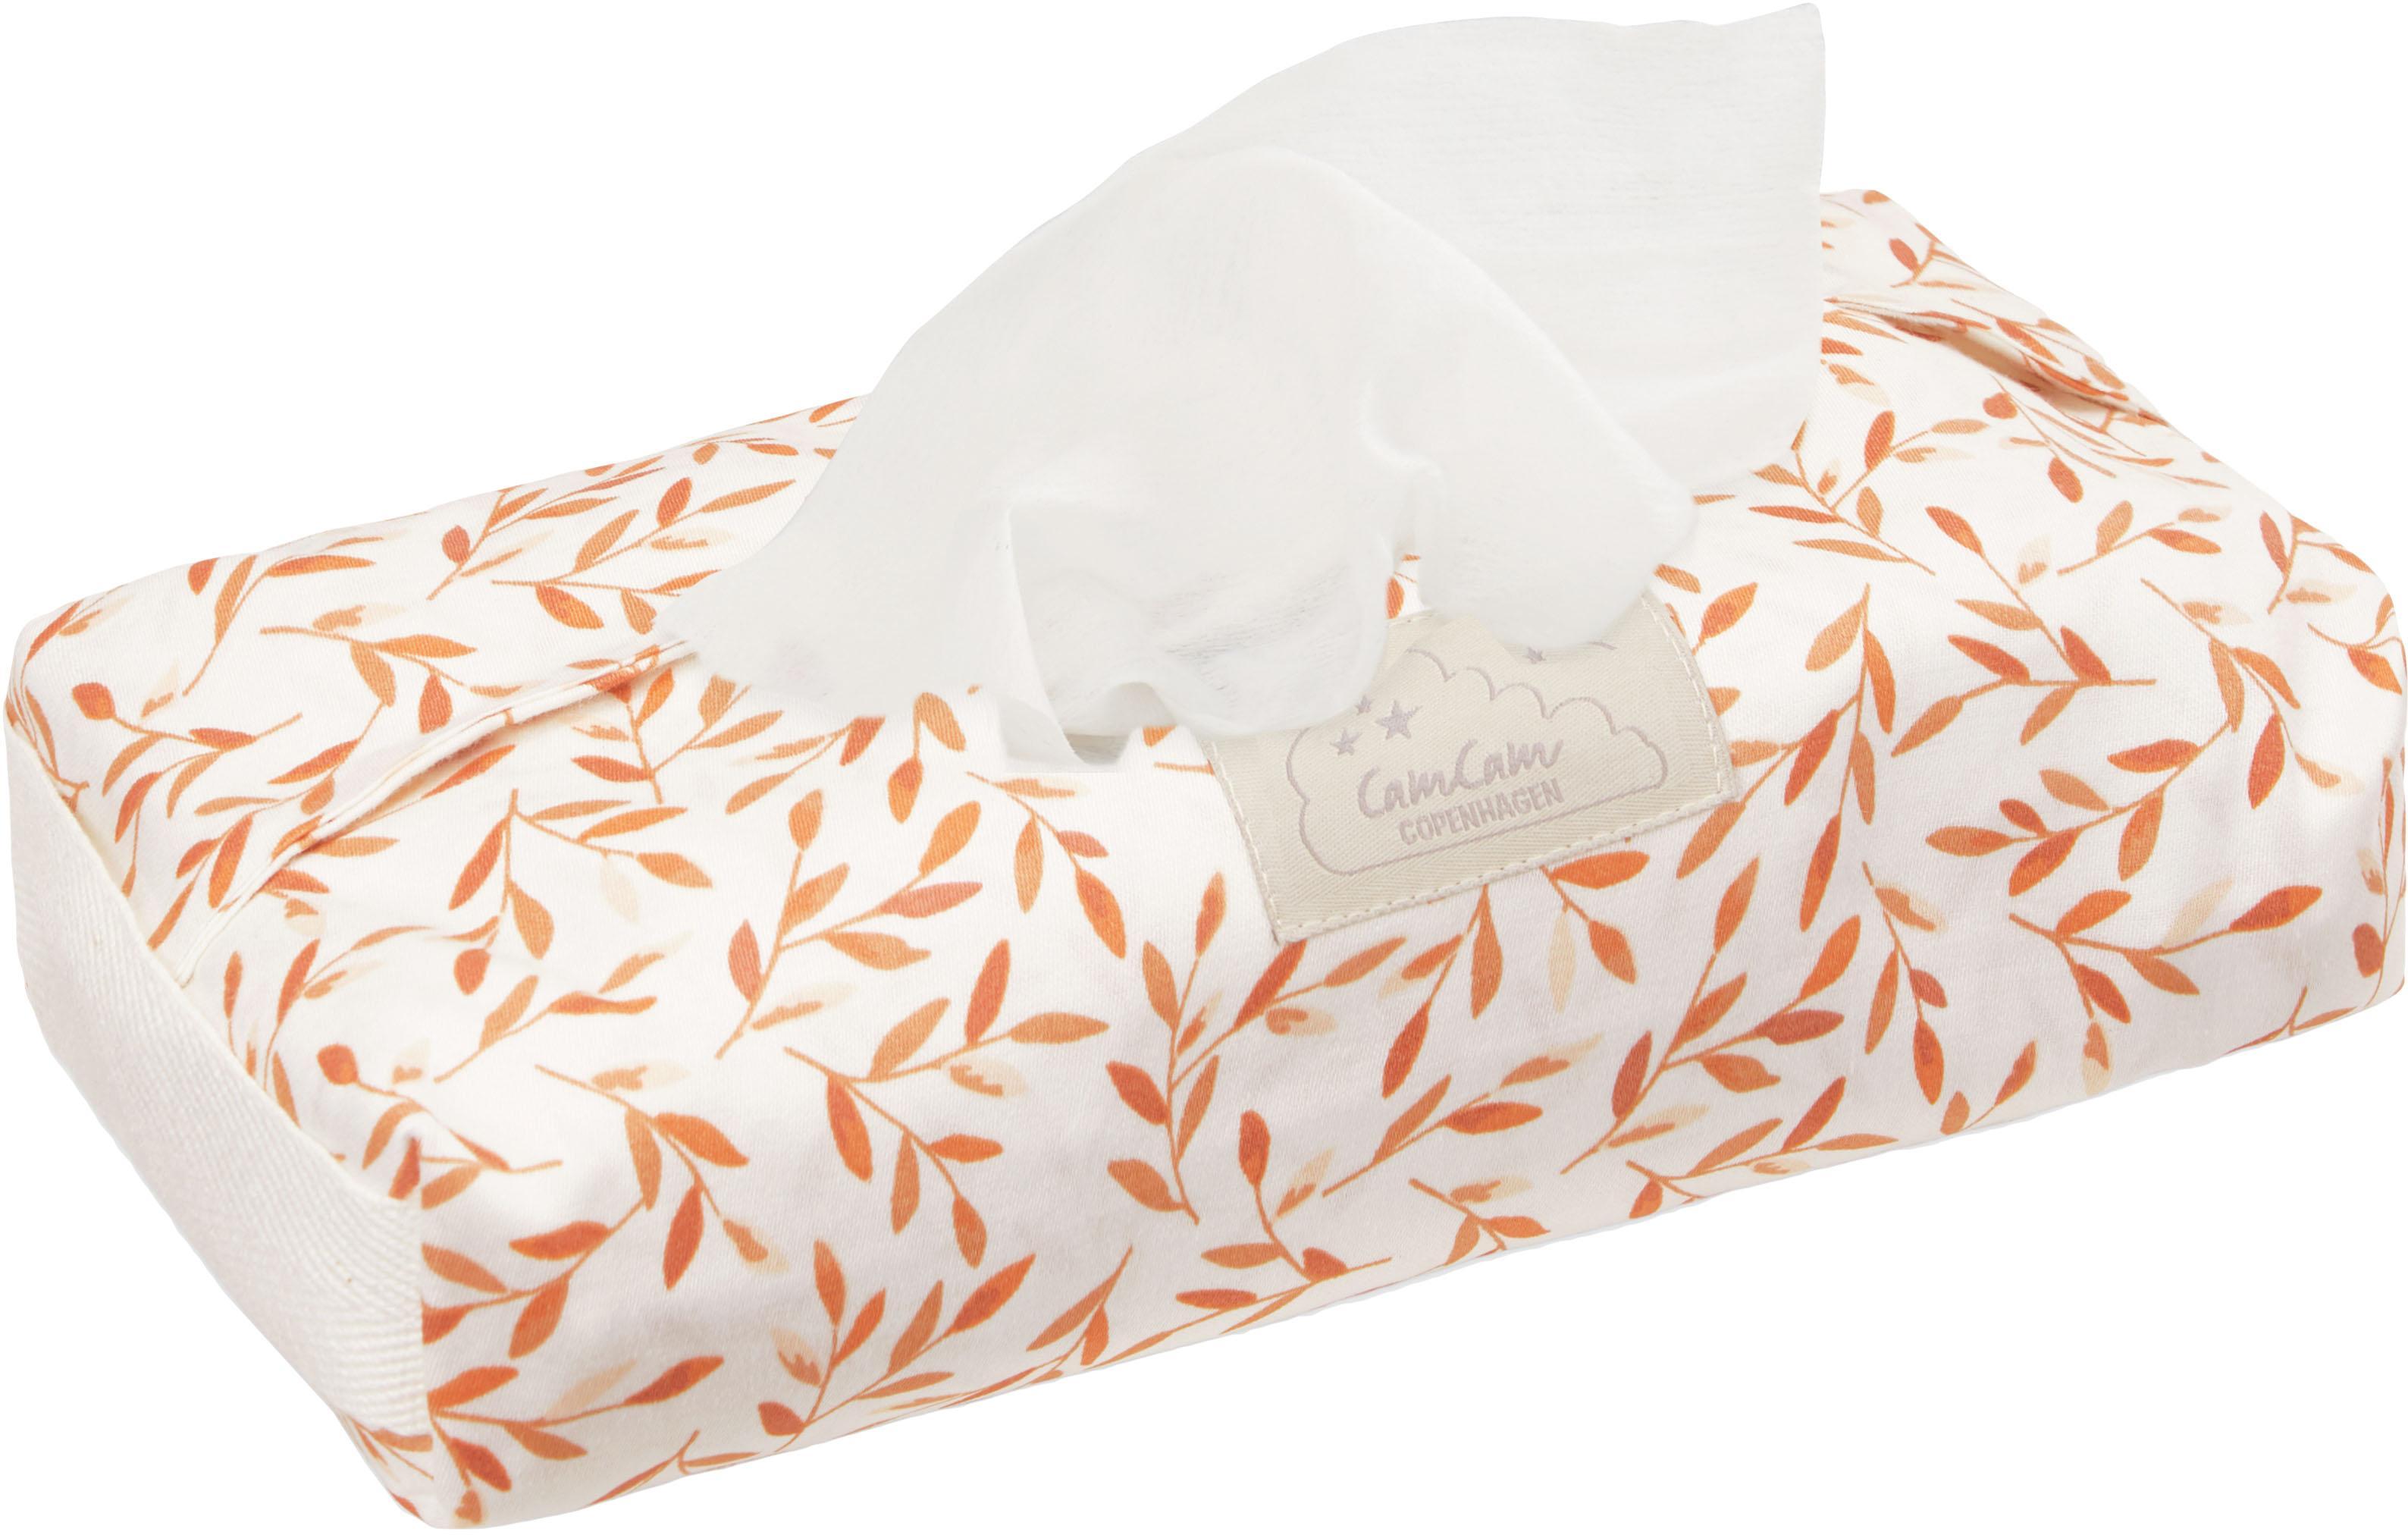 Vochtige doekjeshouder Leaves van biokatoen, Bekleding: 100% biokatoen, GOTS-gece, Crèmekleurig, oranje, 25 x 5 cm